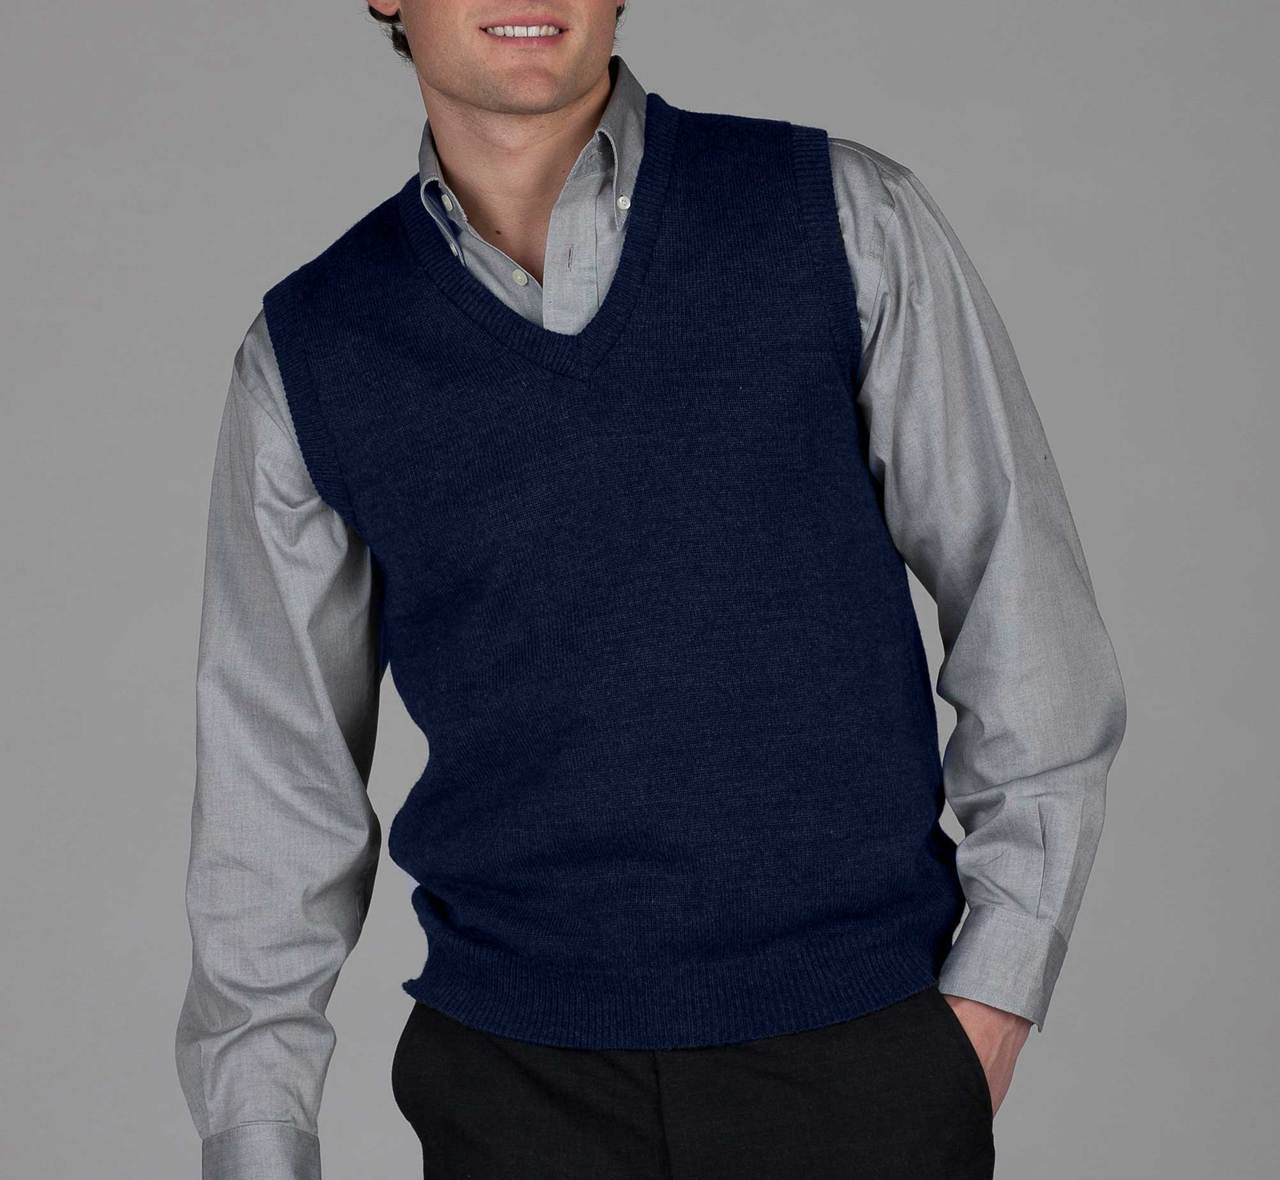 Value Employee Sweater Vest